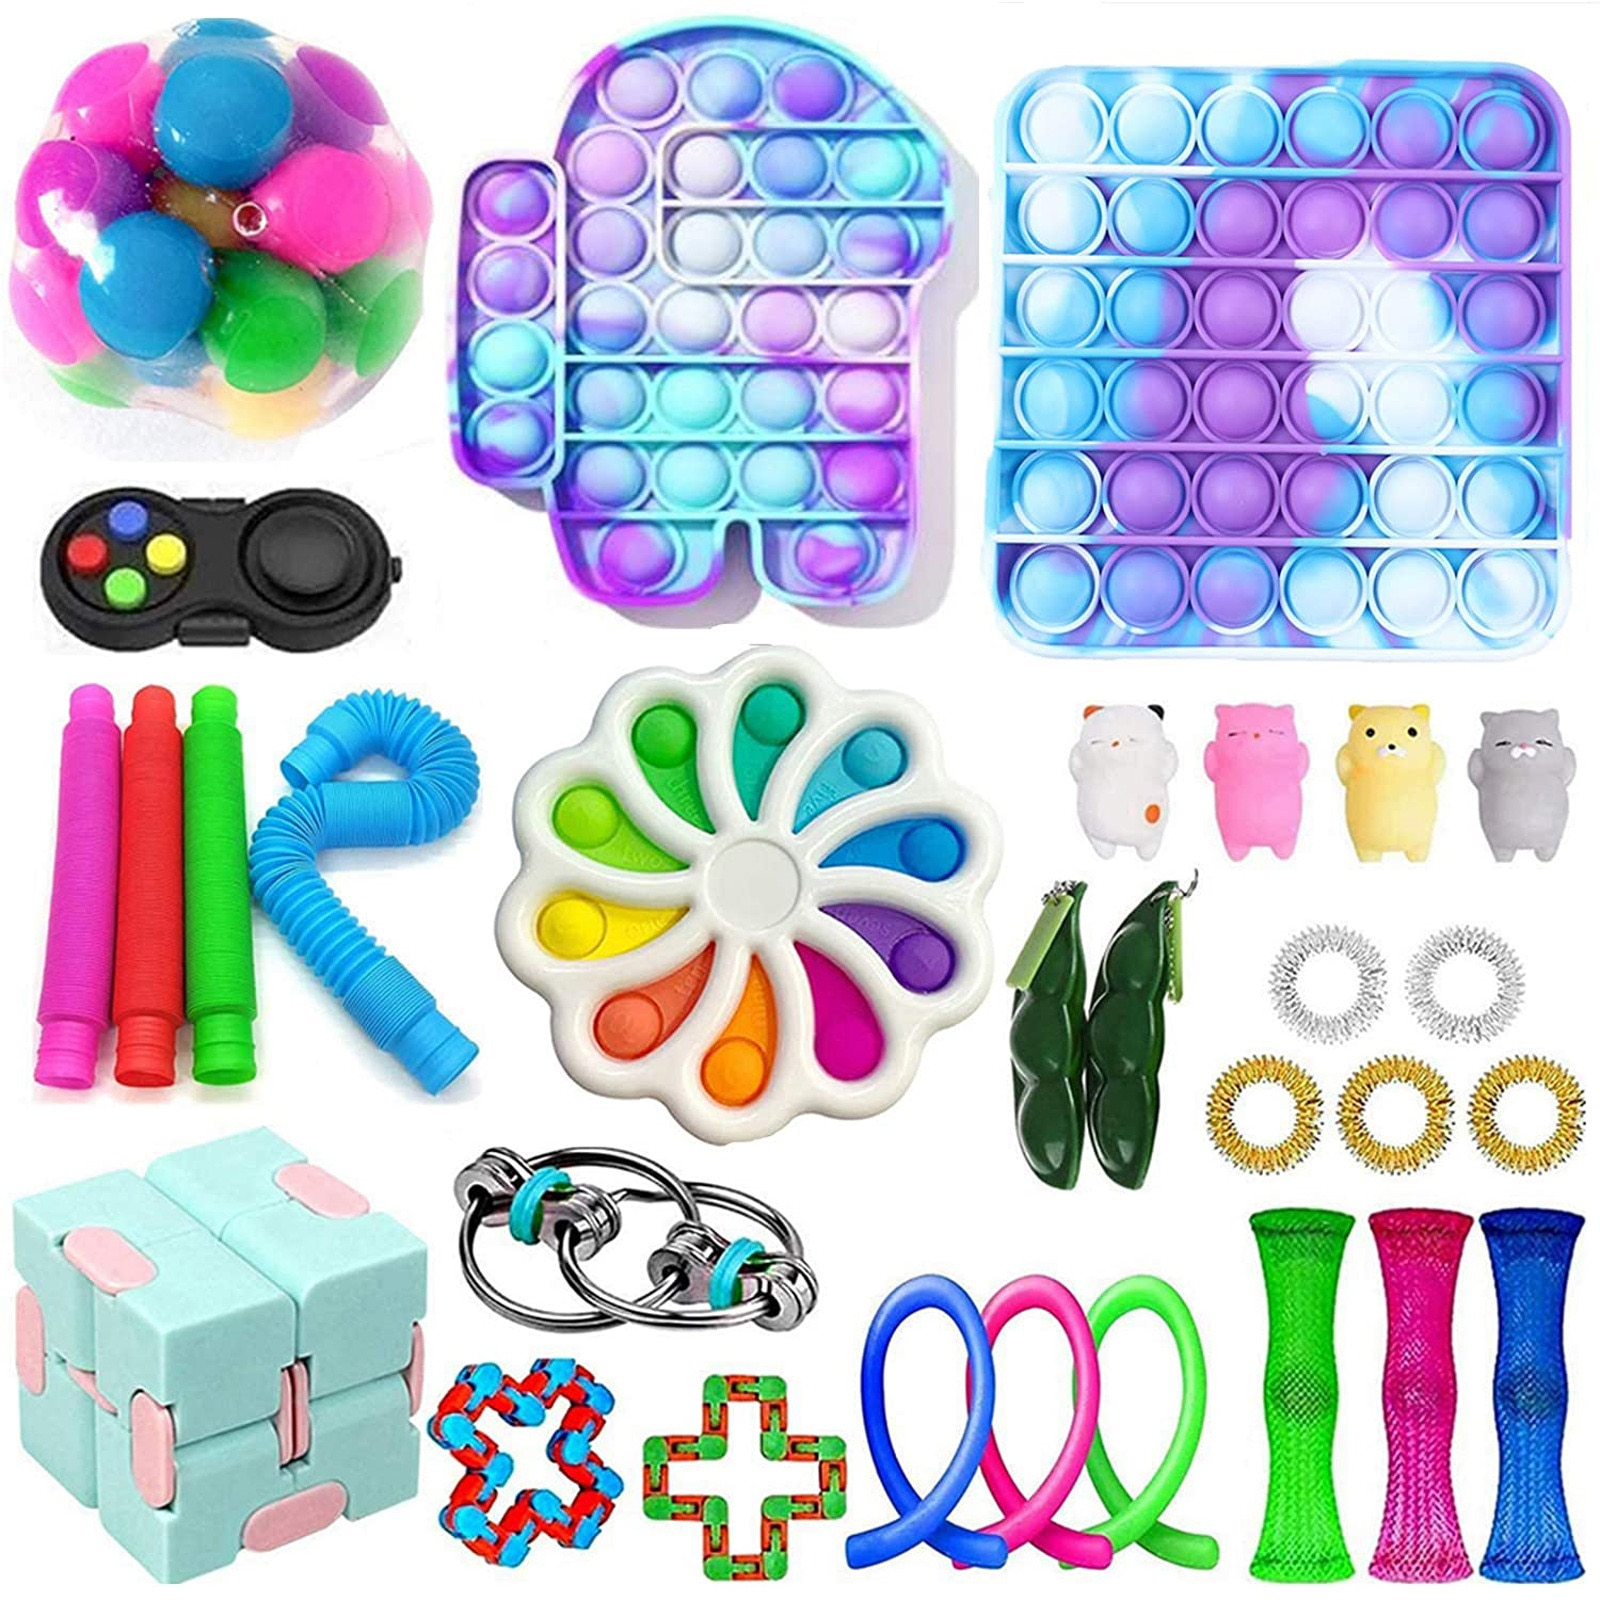 Stress Sensory Toy Set, Sensory Toys With Push Bubble For Children Adults Bubble Fidget Sensory Toy